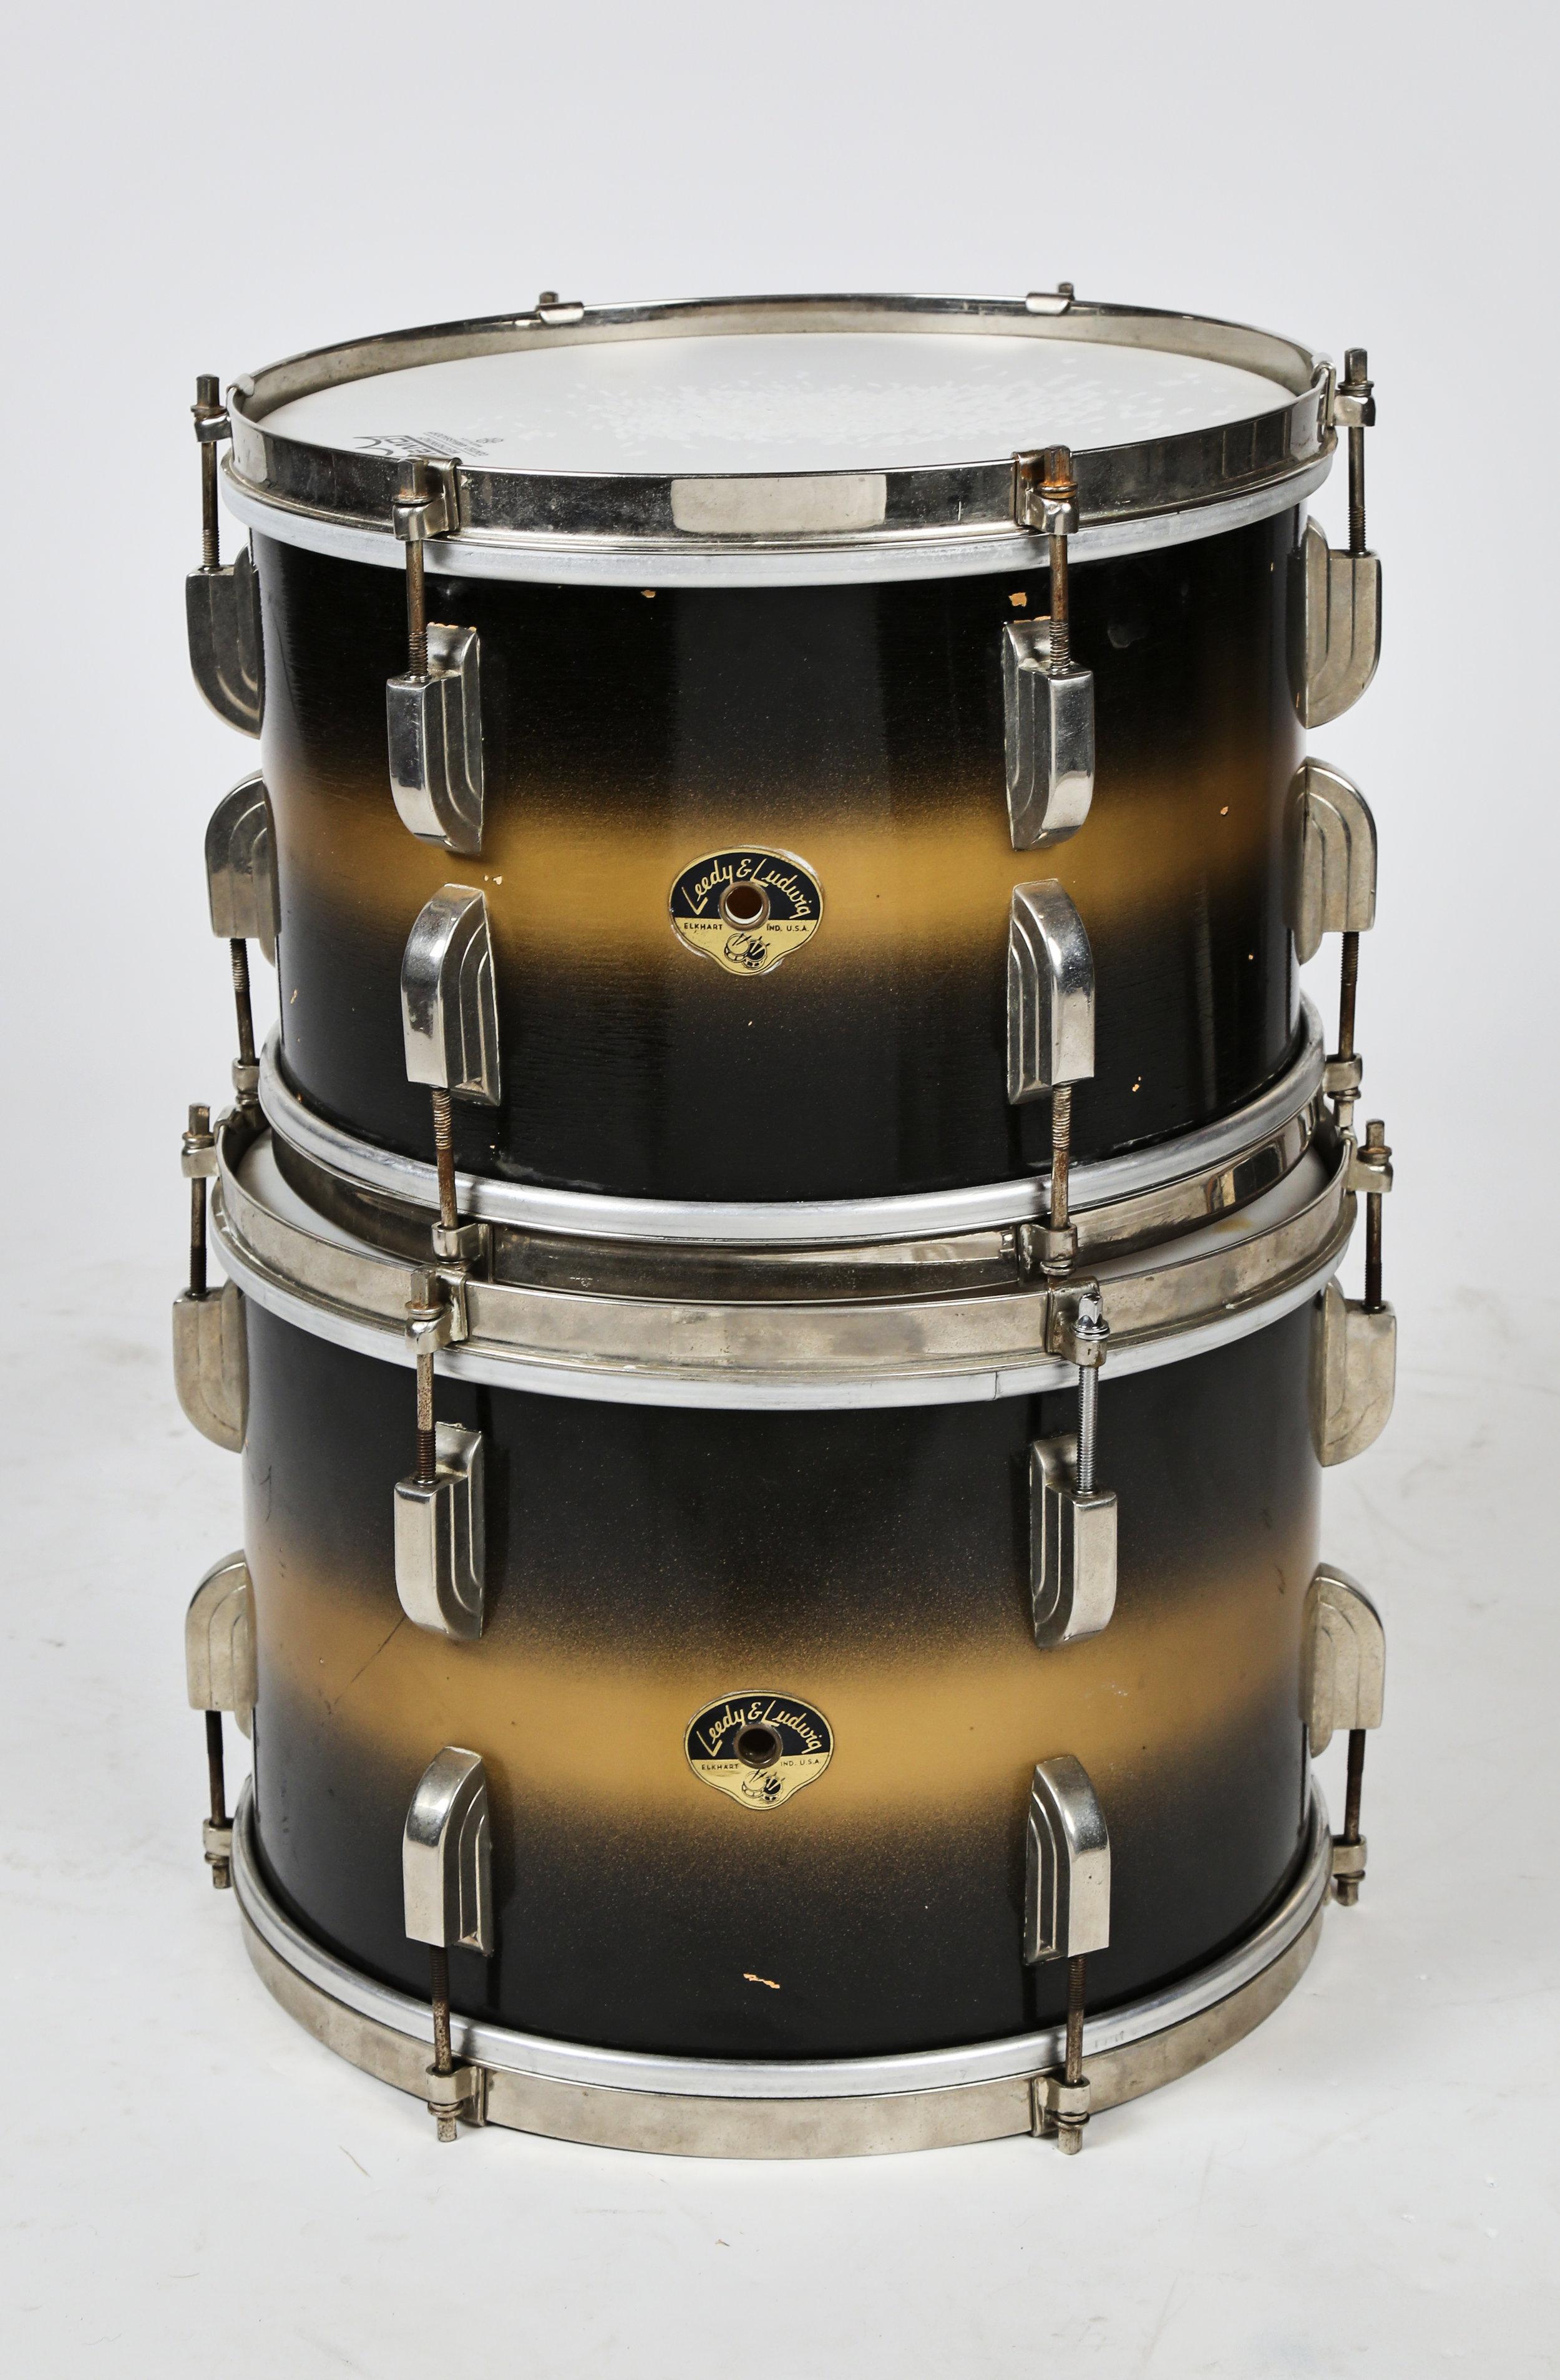 Dorio Vintage Drum_C&C Big Red_1956.jpg